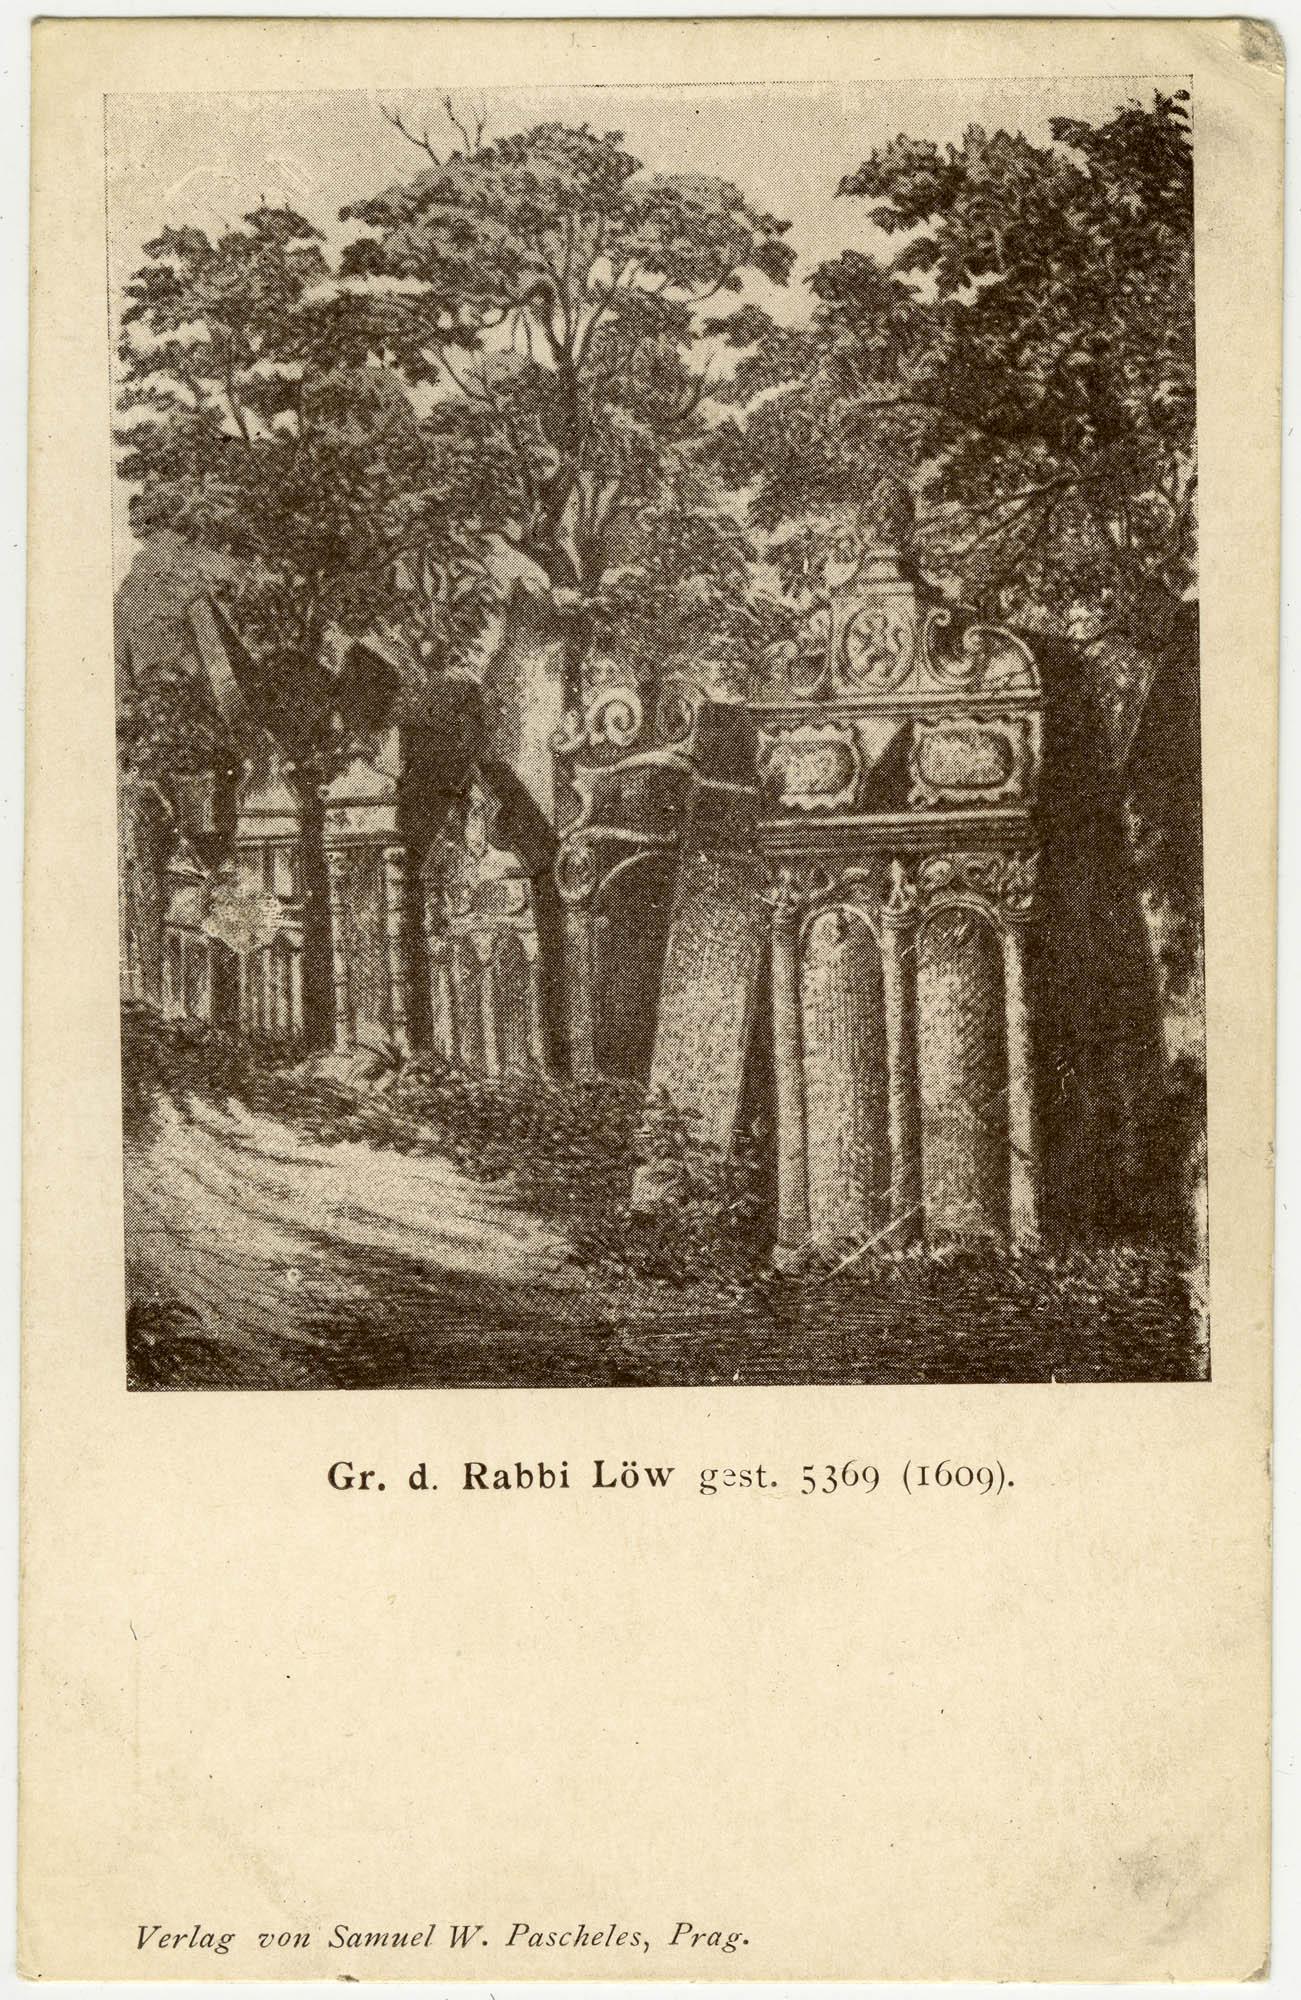 Gr. d. Rabbi Löw gest. 5369 (1609).